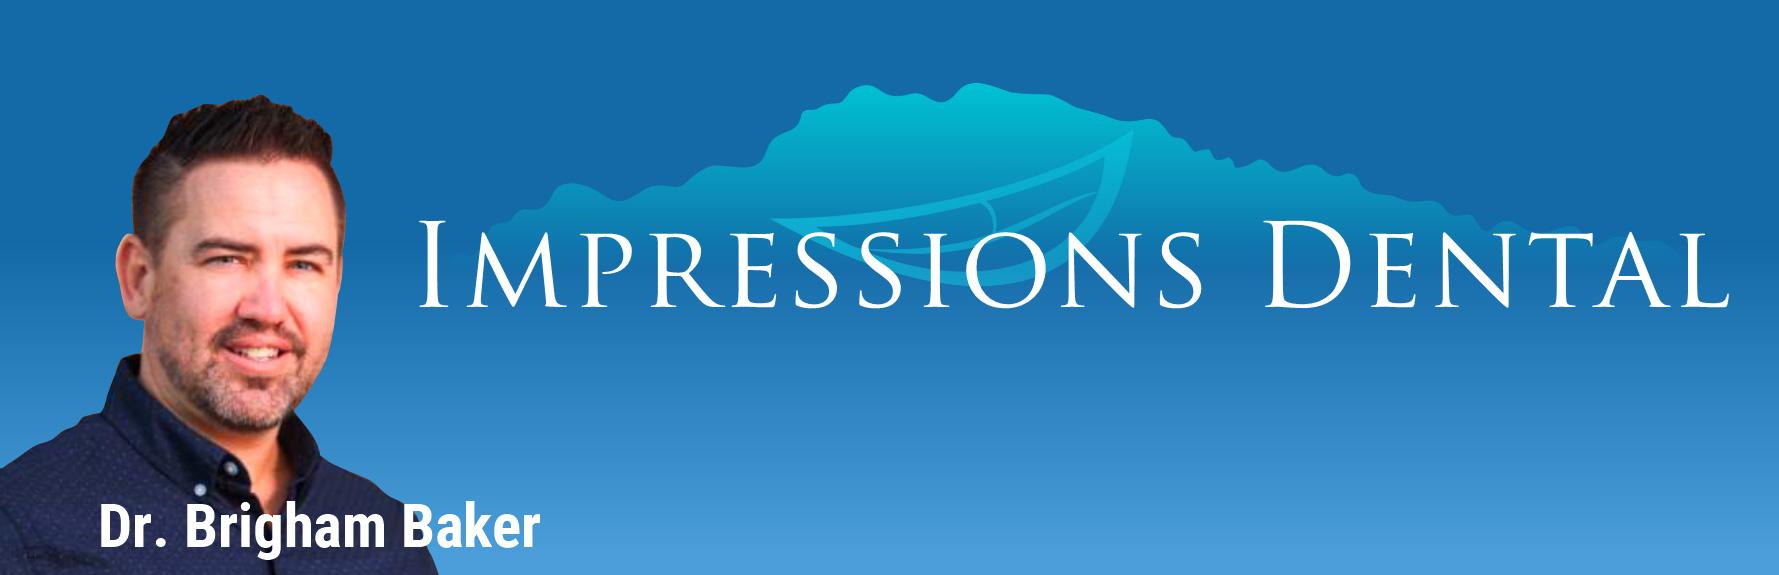 Dr. Brigham Young, Impressions Dental